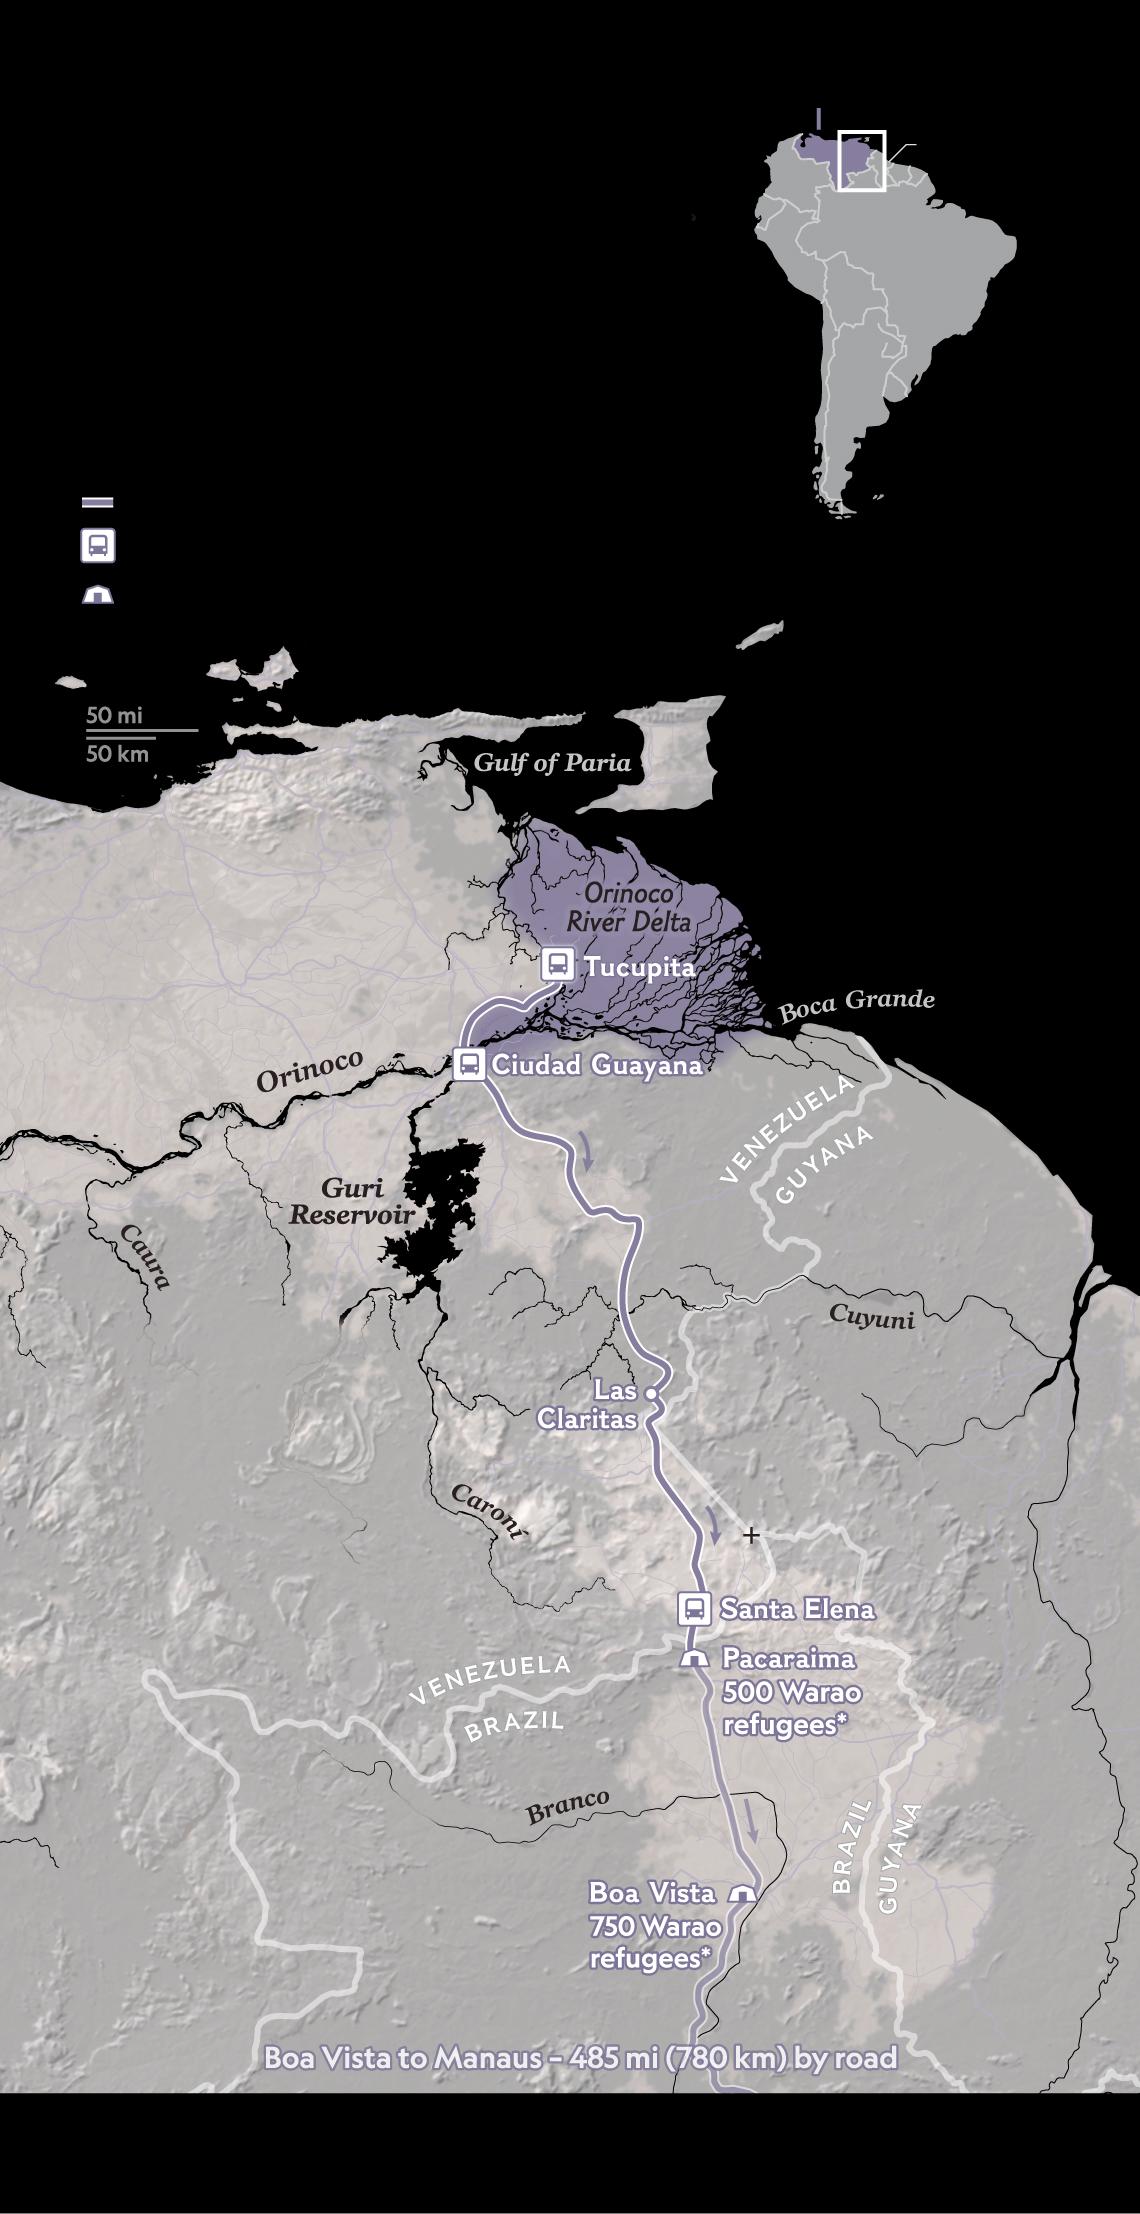 For Many Fleeing Venezuela\'s Chaos, New Trouble in Brazil